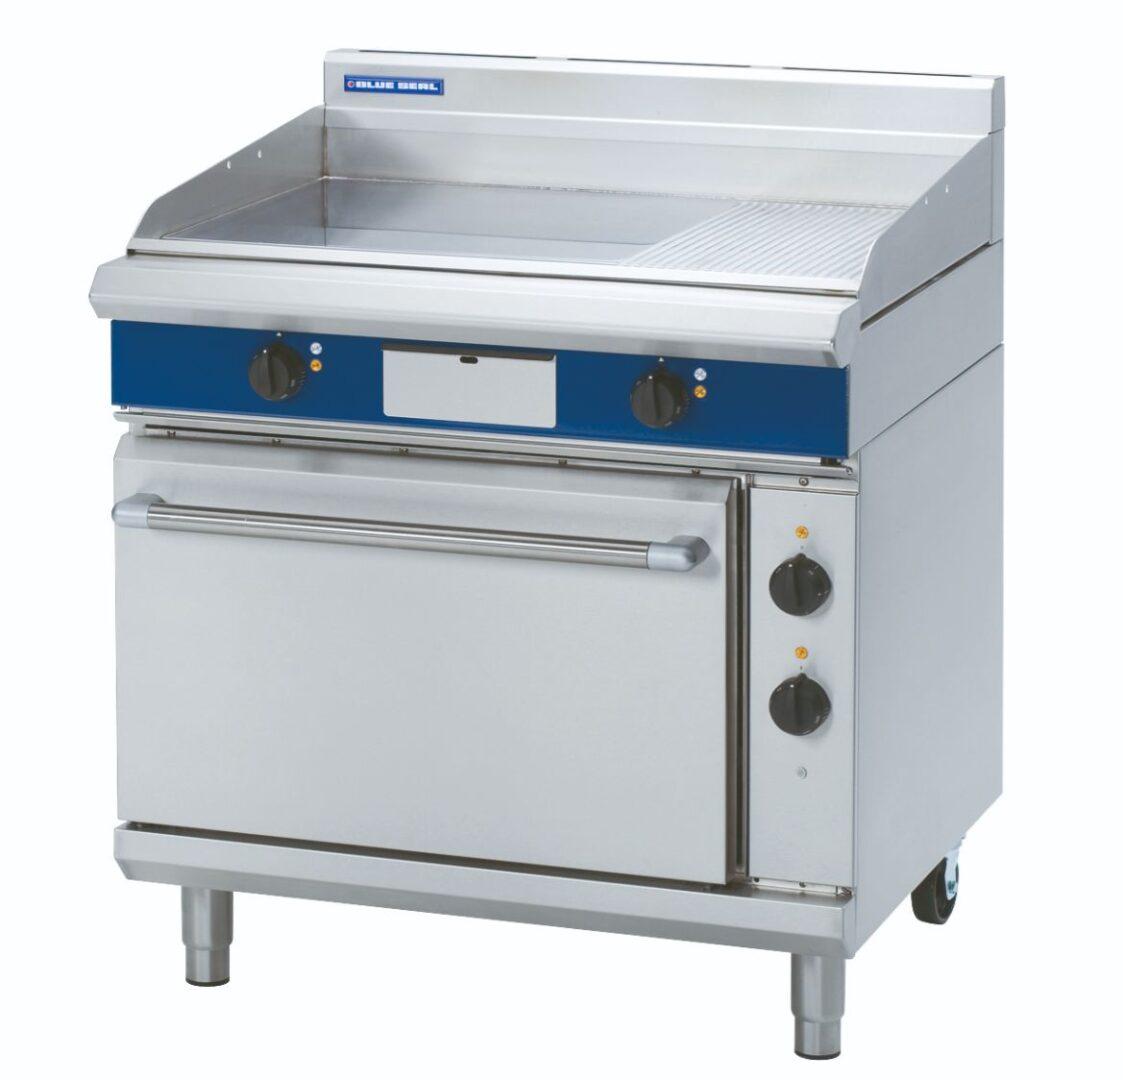 Blue Seal Evolution Series EP506 – 900mm Electric Griddle Static Oven Range